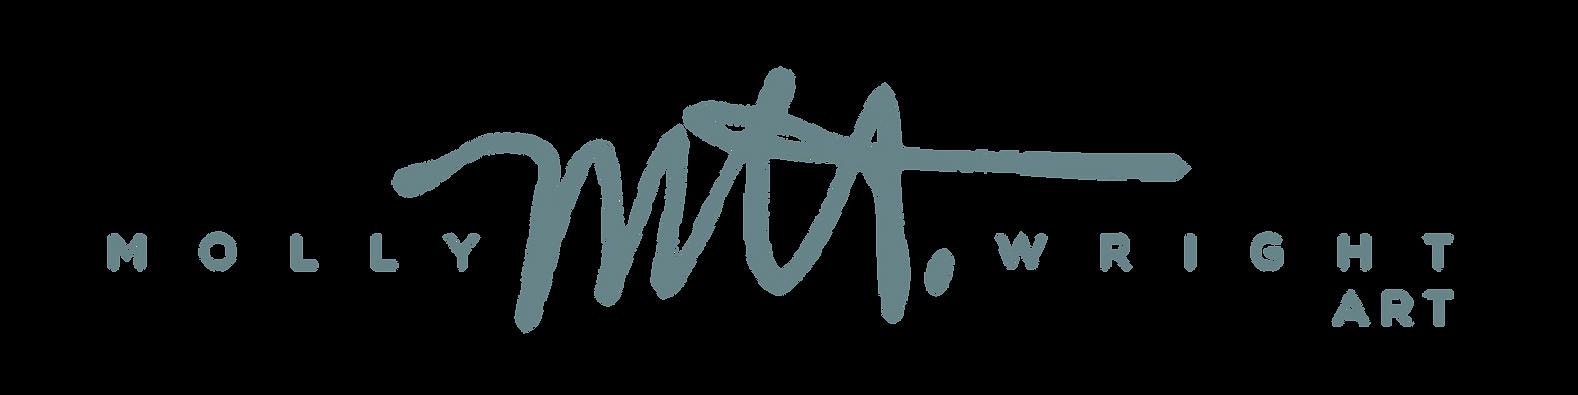 MollyWright-ArtistSignatures-Transparent